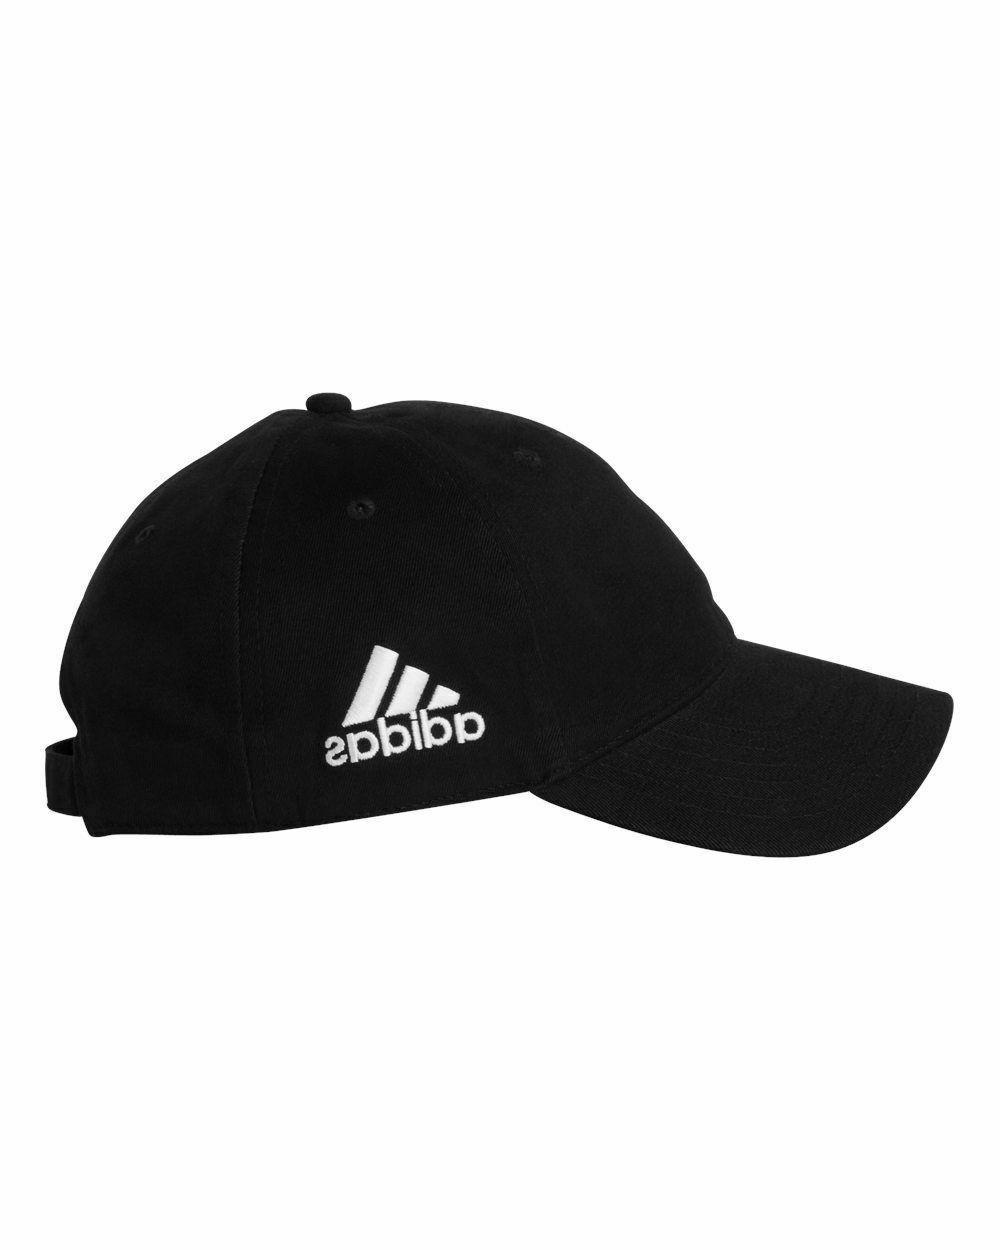 ADIDAS GOLF Cotton Crest Twill Unstructured Ball Adjustable A12